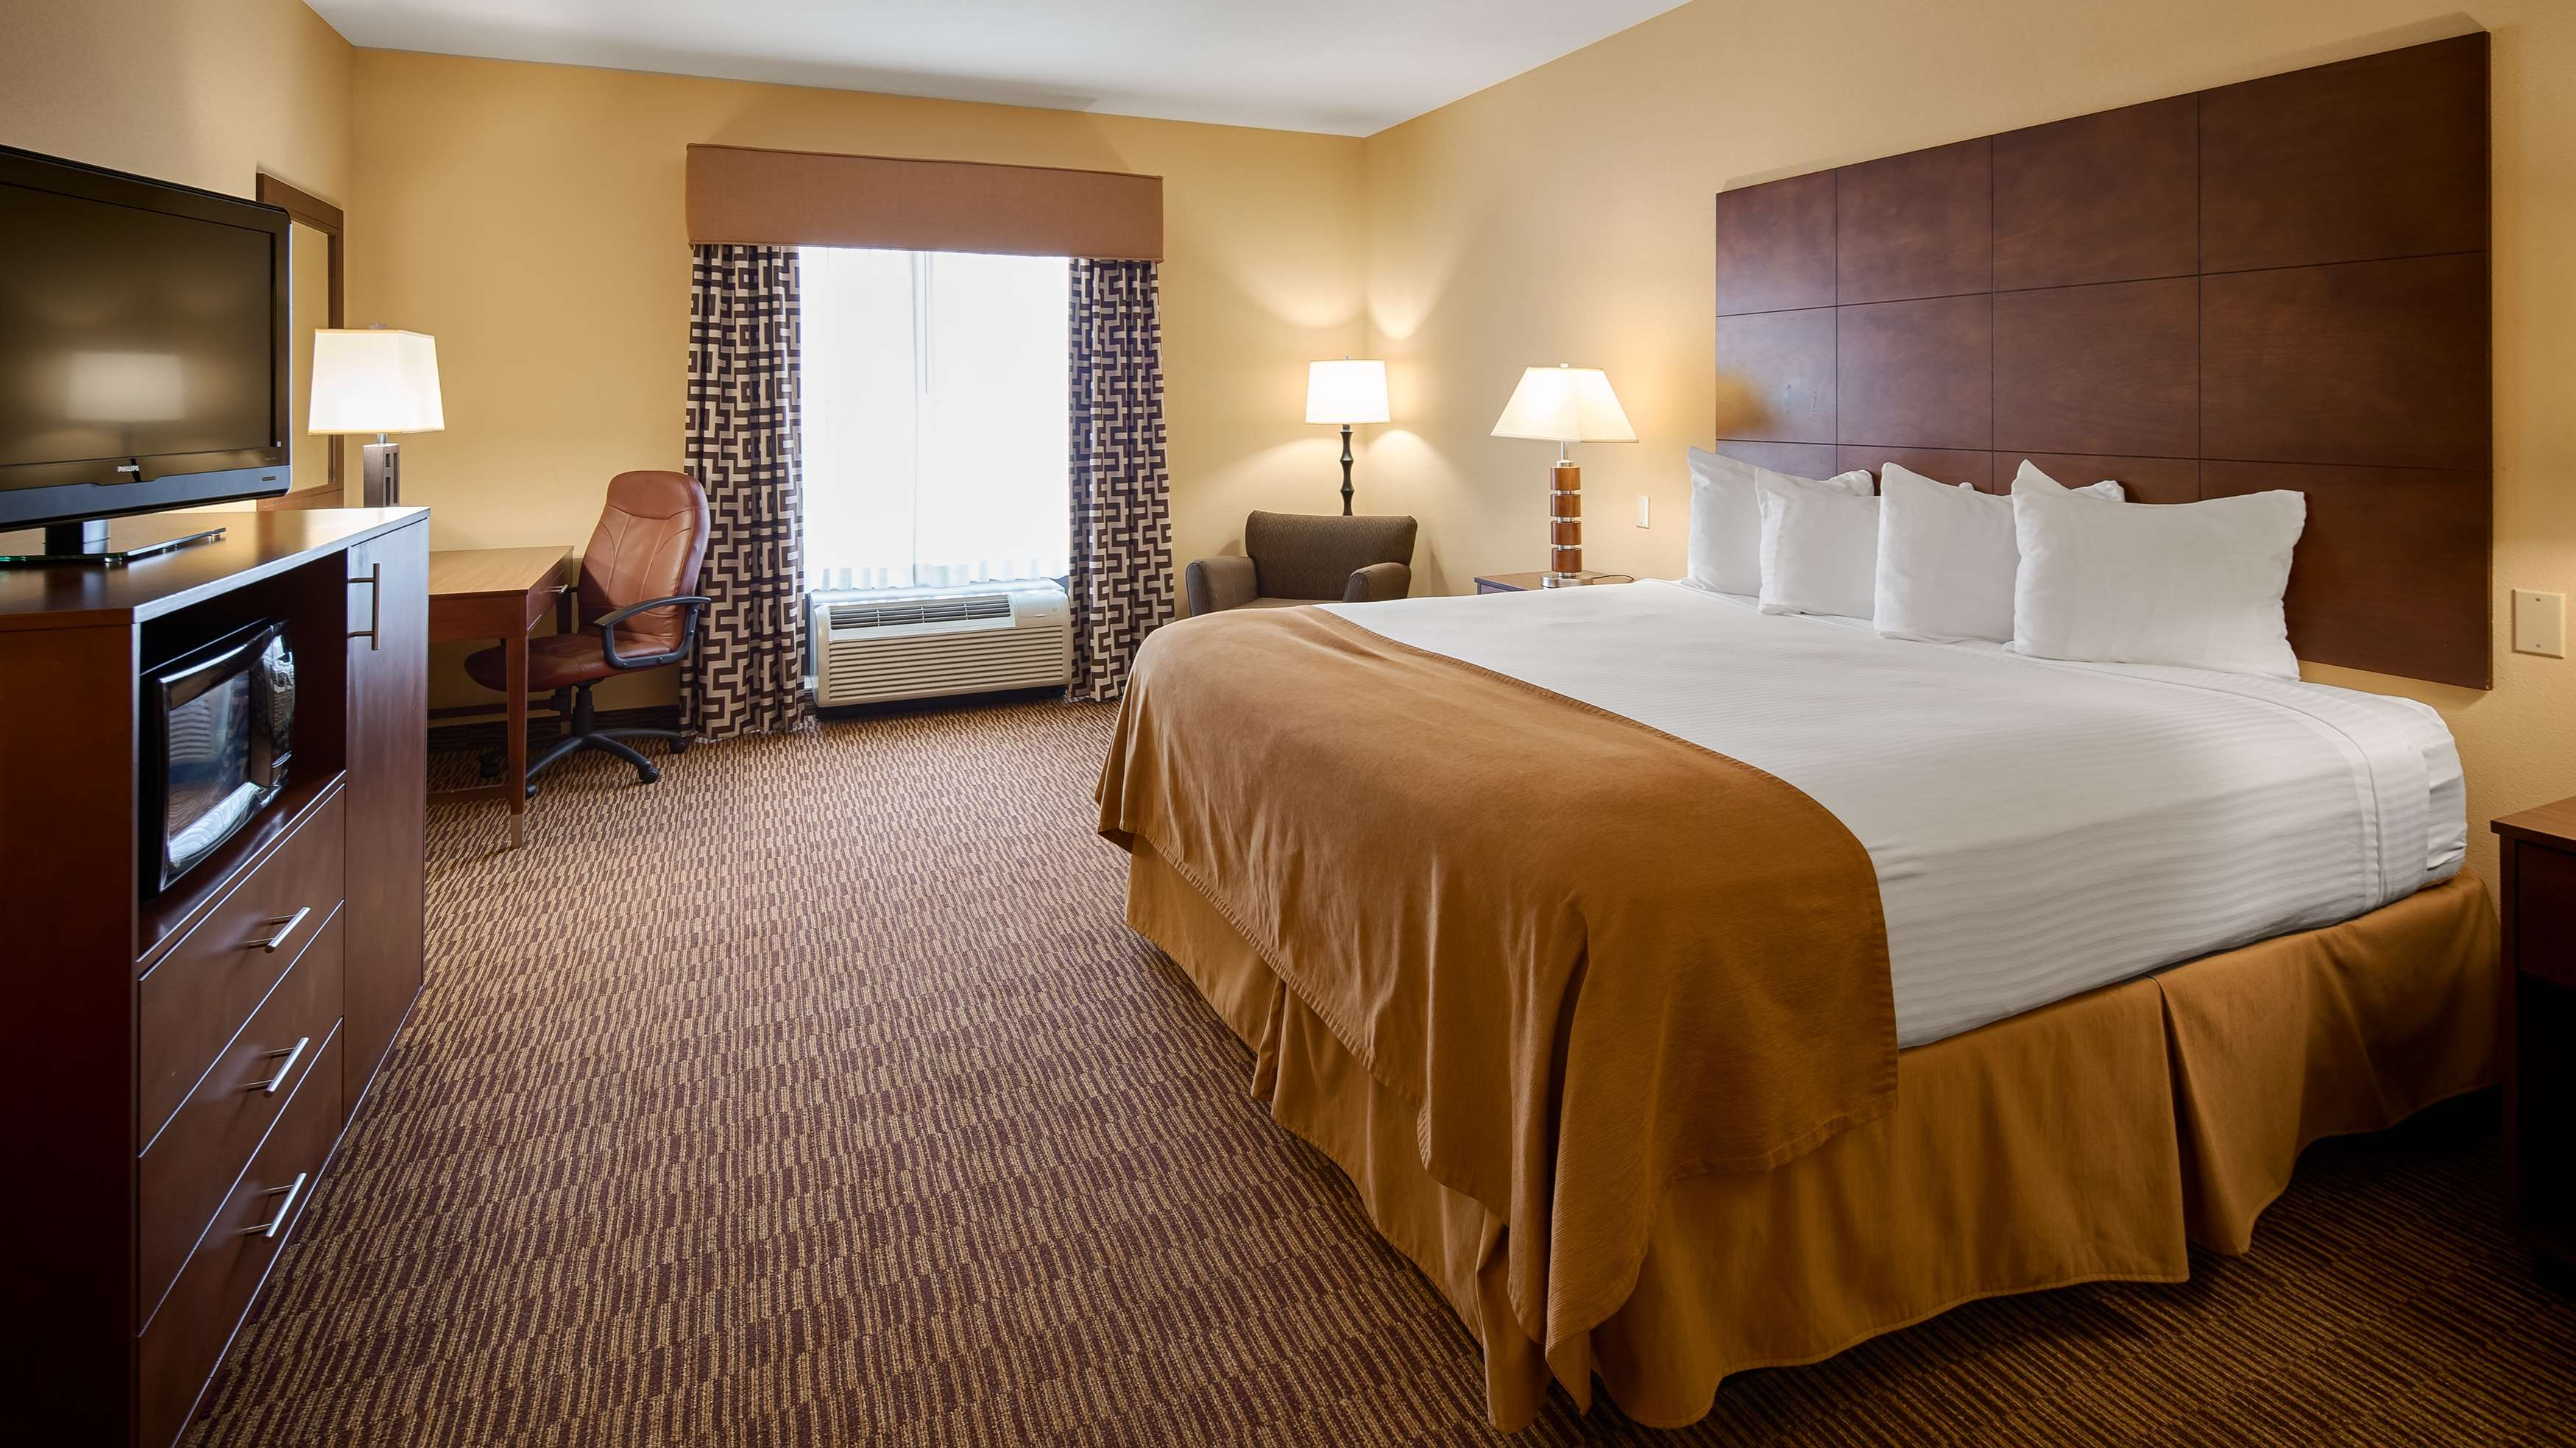 Best Western St. Francisville Hotel image 11